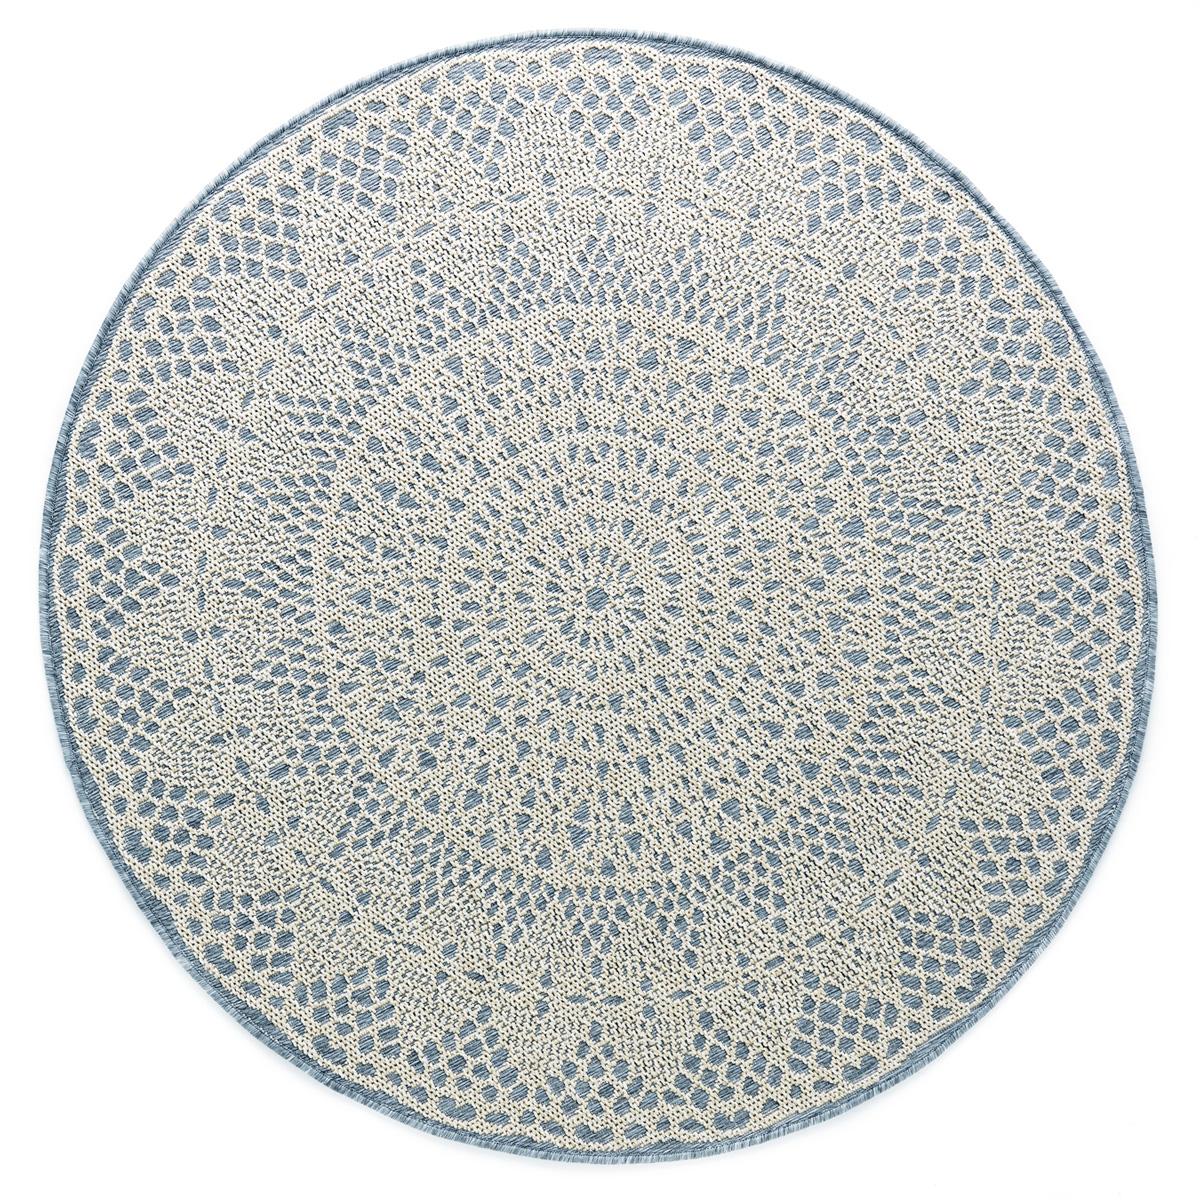 Tapis rond crochet gris 135x135